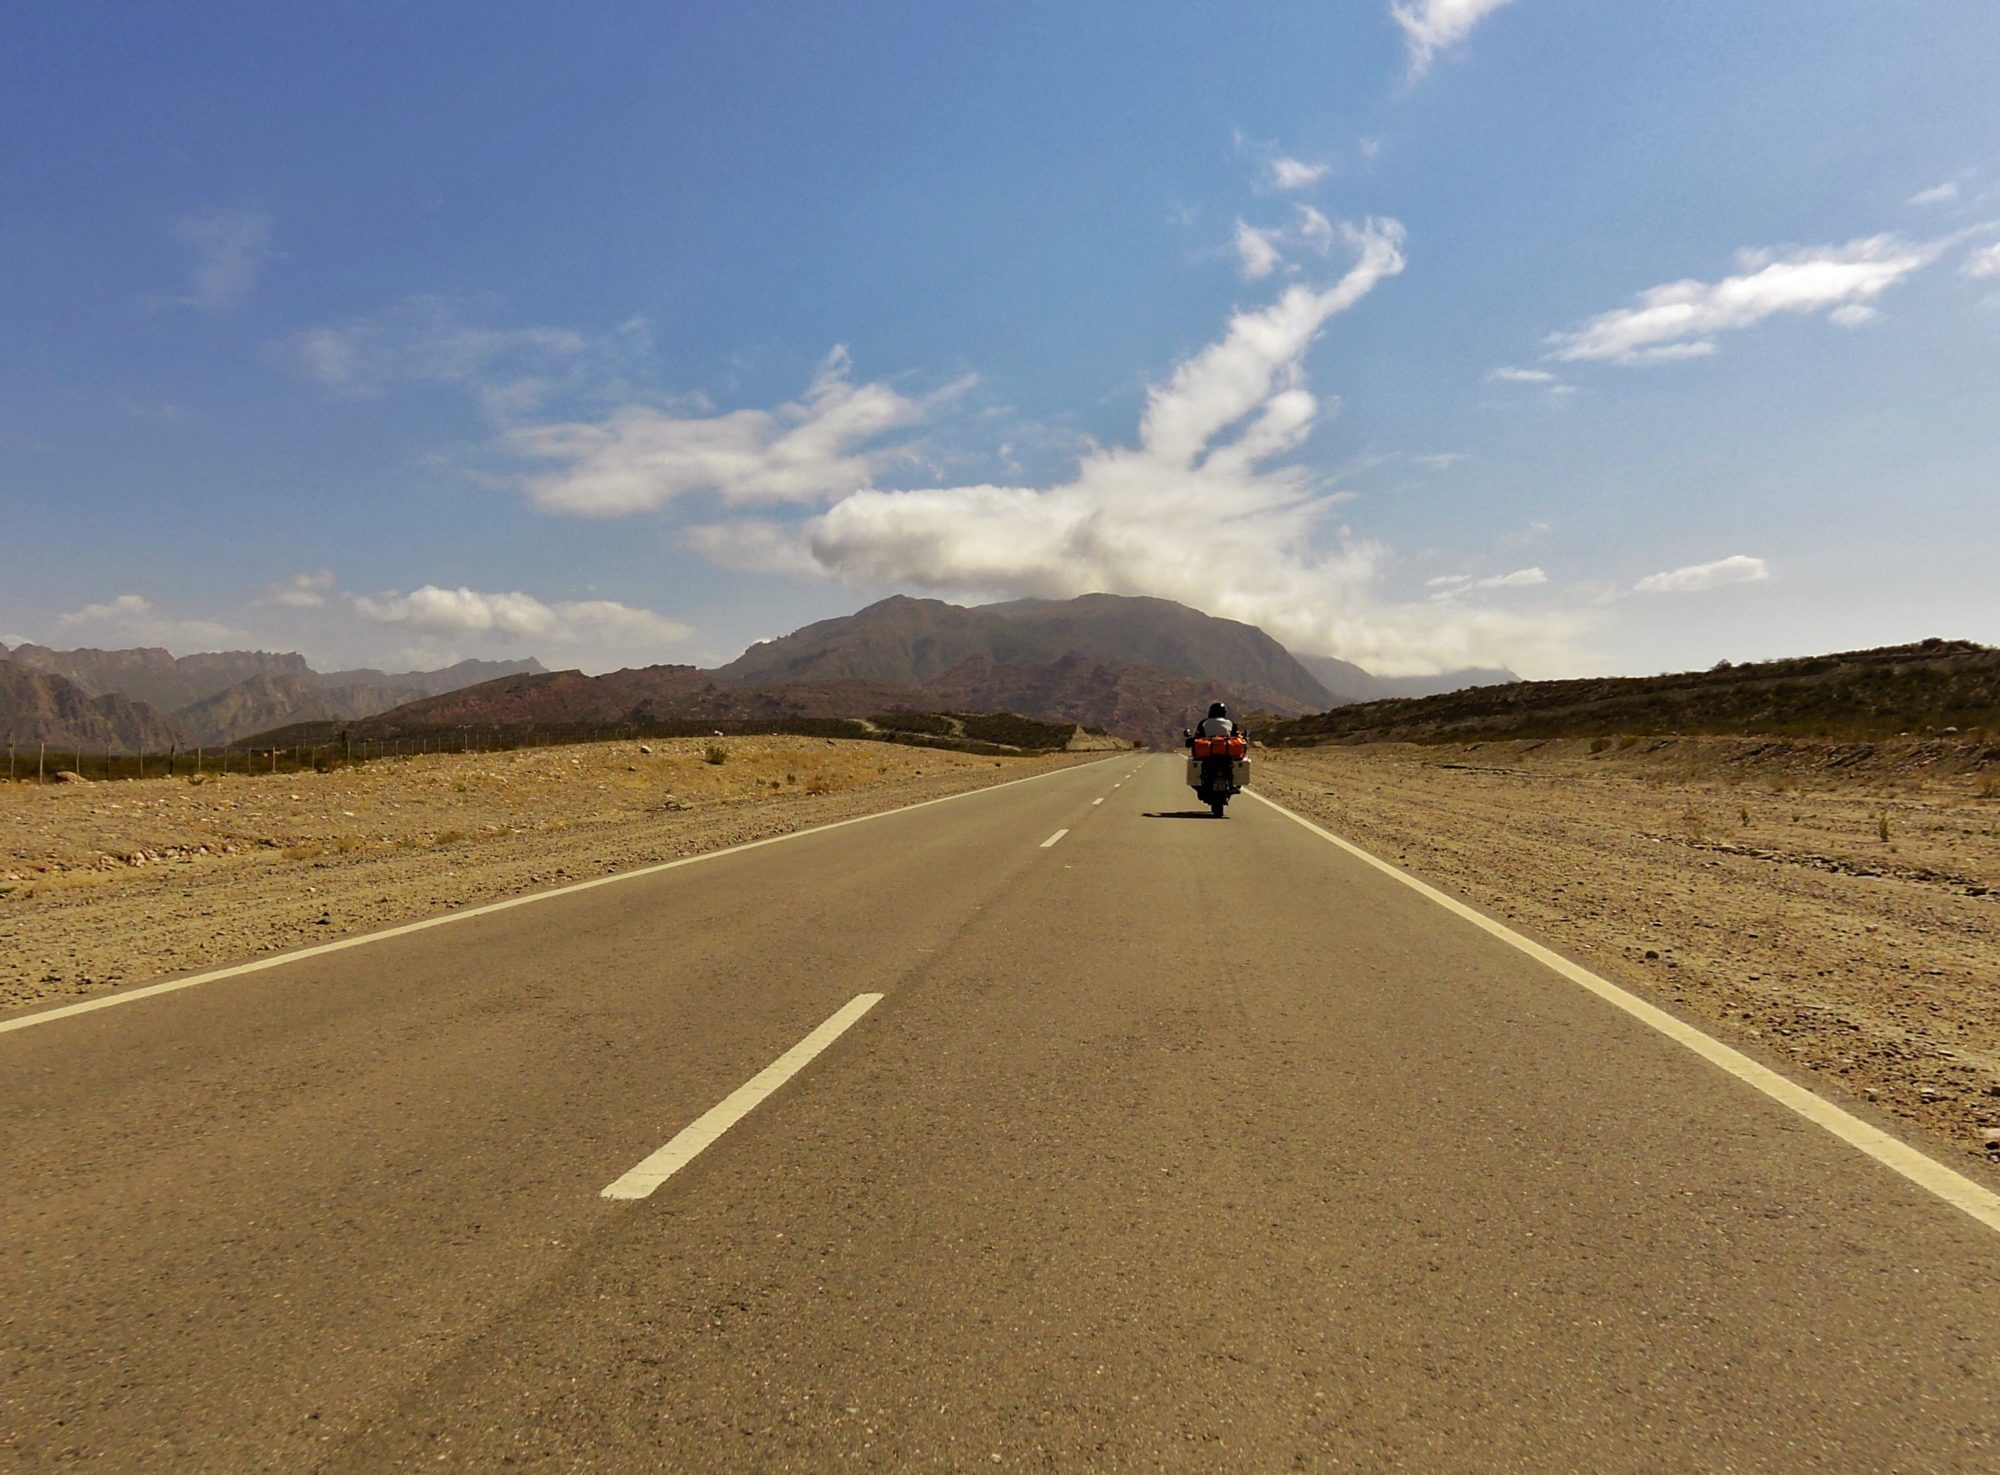 Anfahrt zum Plateau